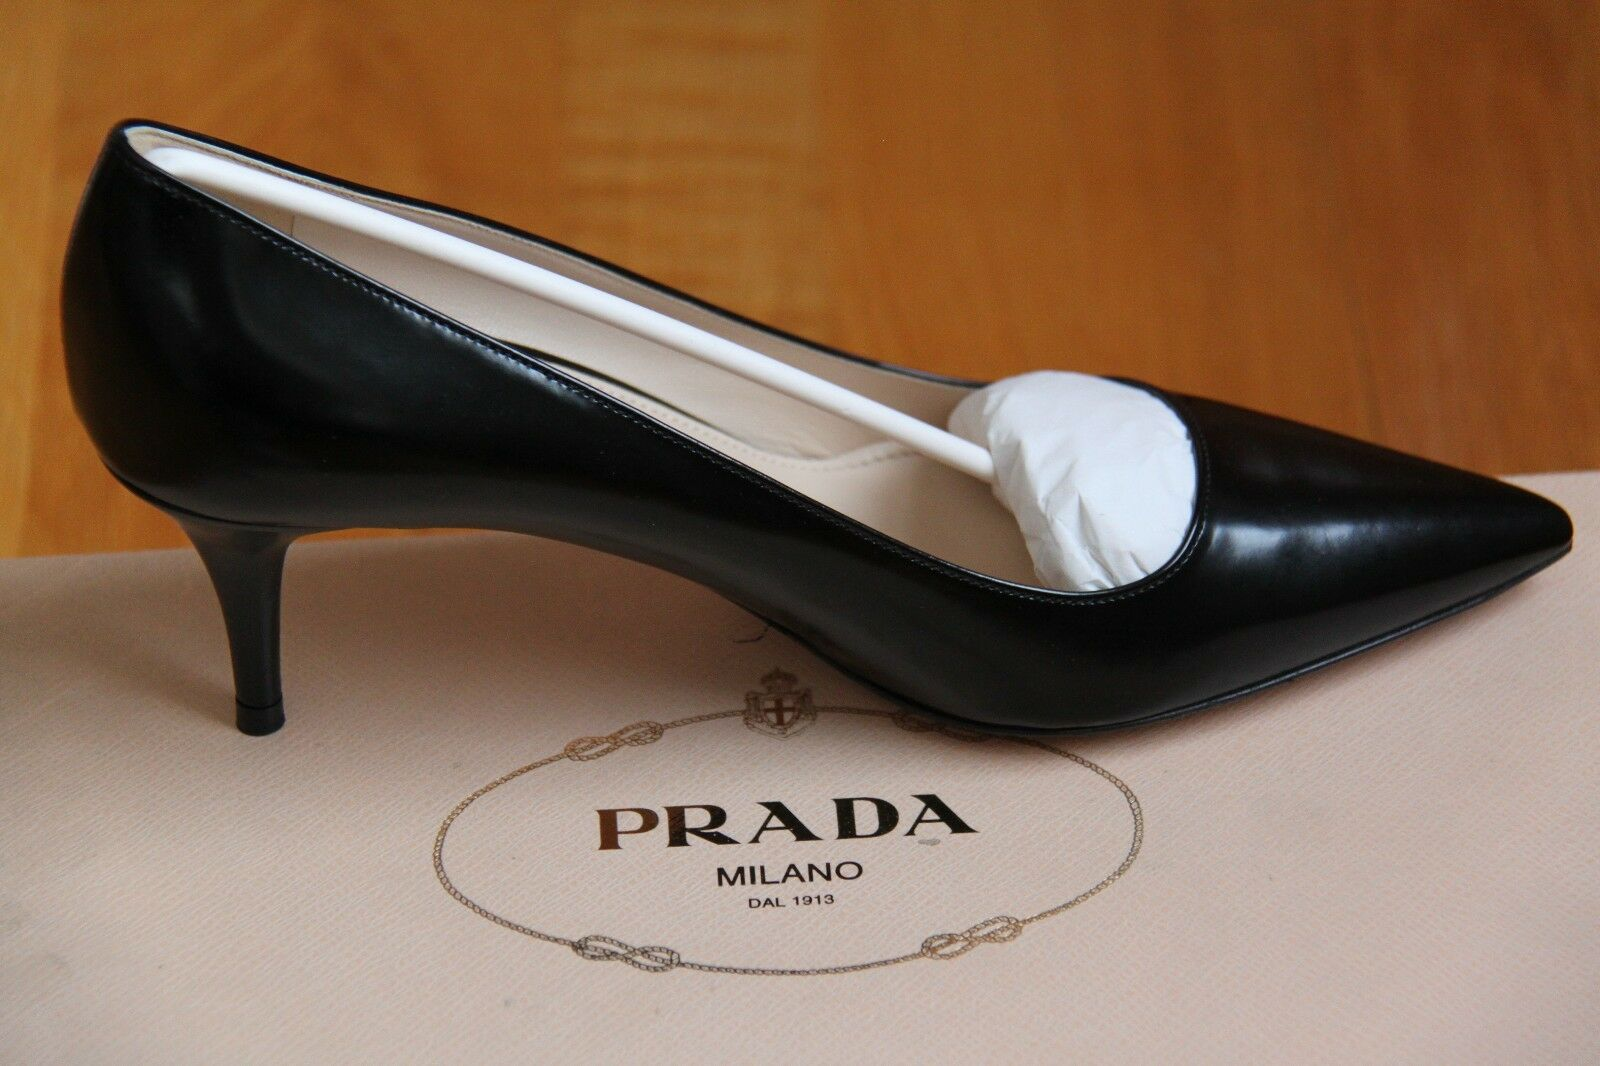 NIB New PRADA 1I619D LOW HEEL PUMPS shoes shoes shoes Black Sizes 35-39   650+tax c1c740